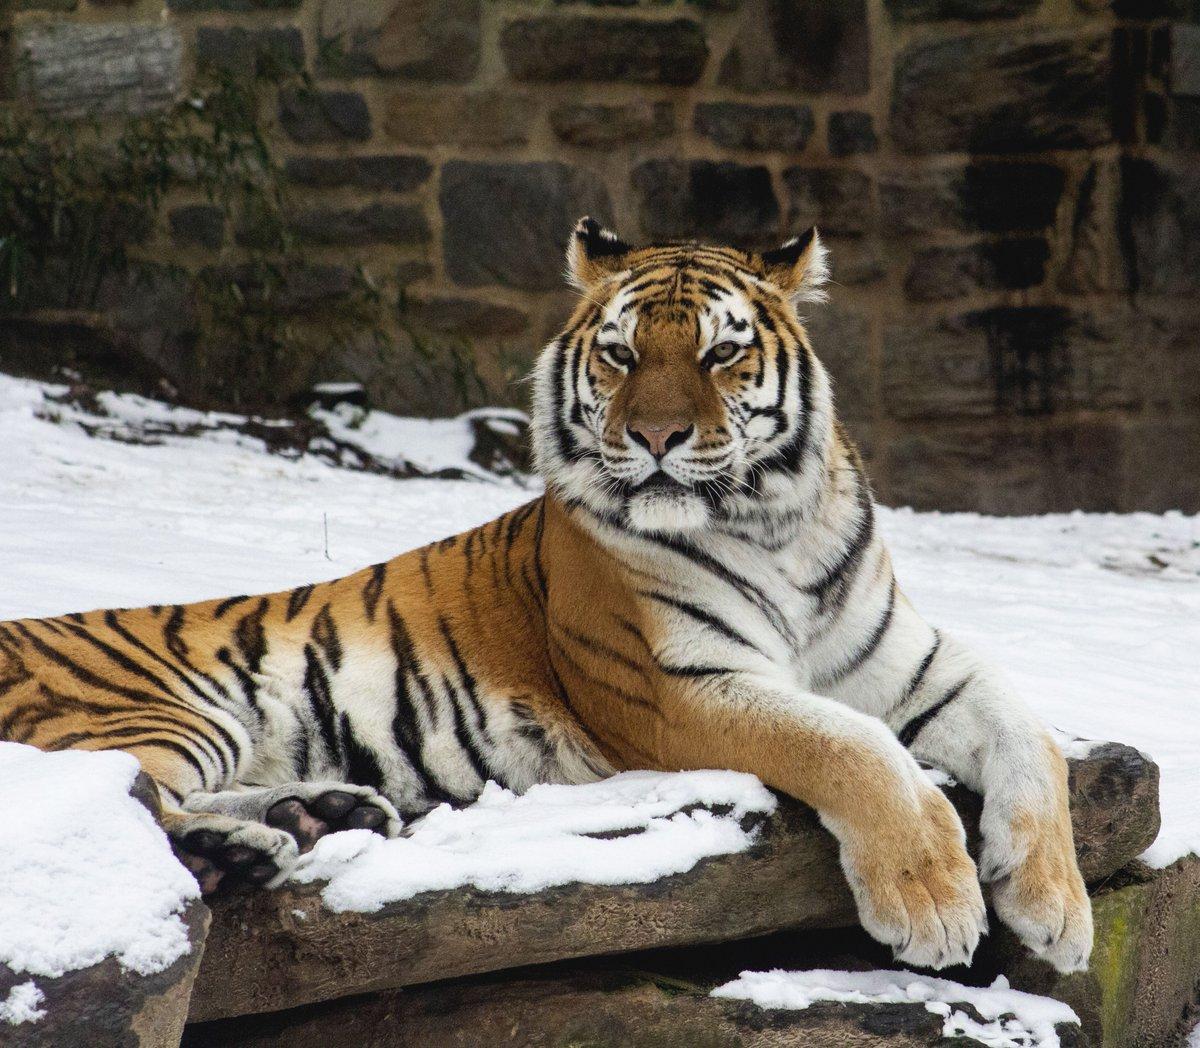 Our female Amur #tiger, Koosaka, enjoying a #snowday at the Zoo! 🐯❄ https://t.co/0GzuWmcuUK